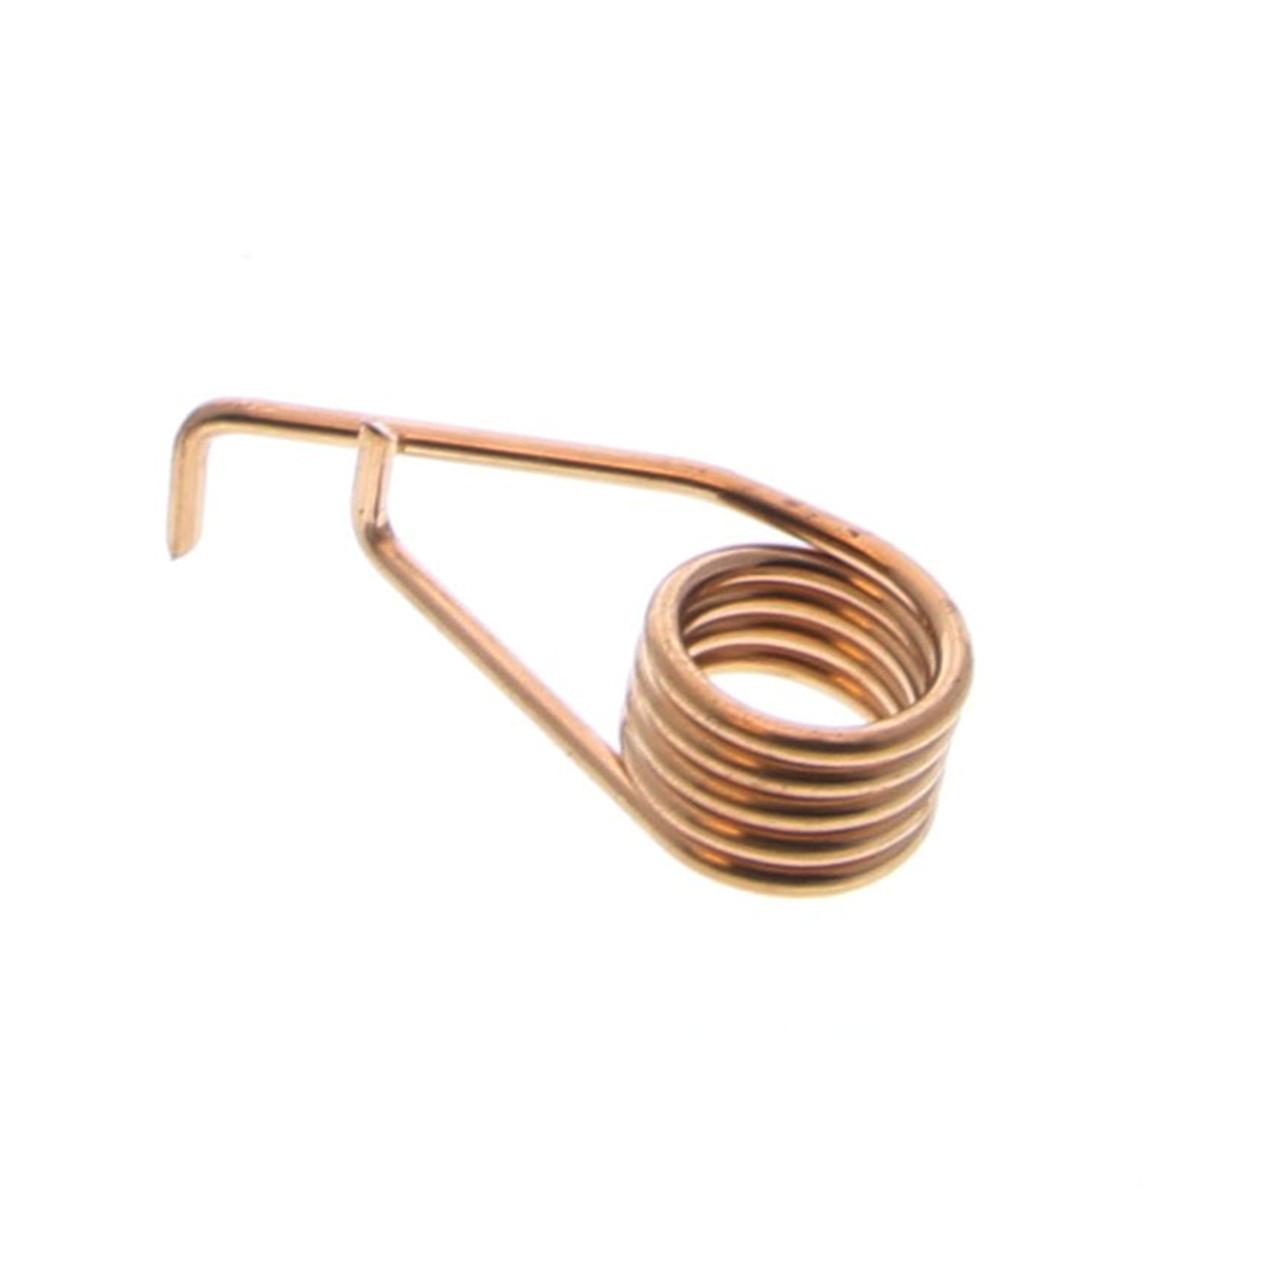 SHINDAIWA Spring Spark Plug A426000050 - Image 1